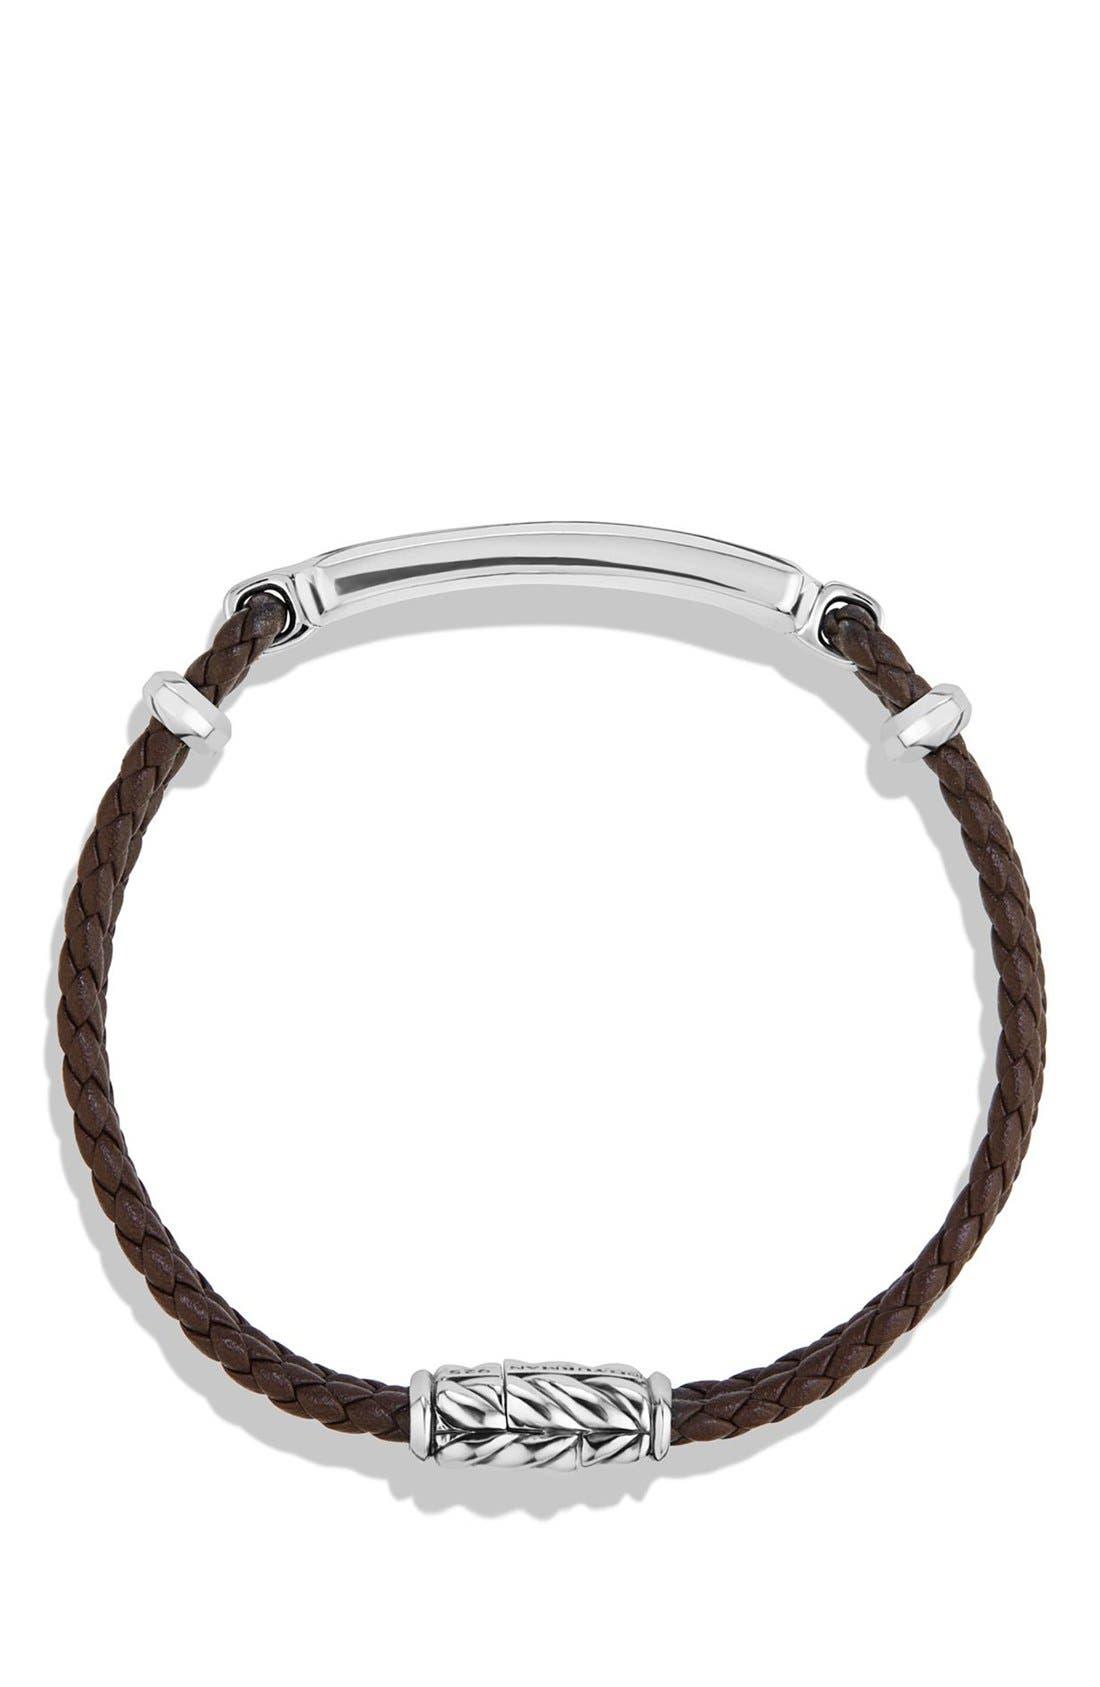 Bar Station Leather Bracelet,                             Alternate thumbnail 2, color,                             SILVER/ TIGERS EYE